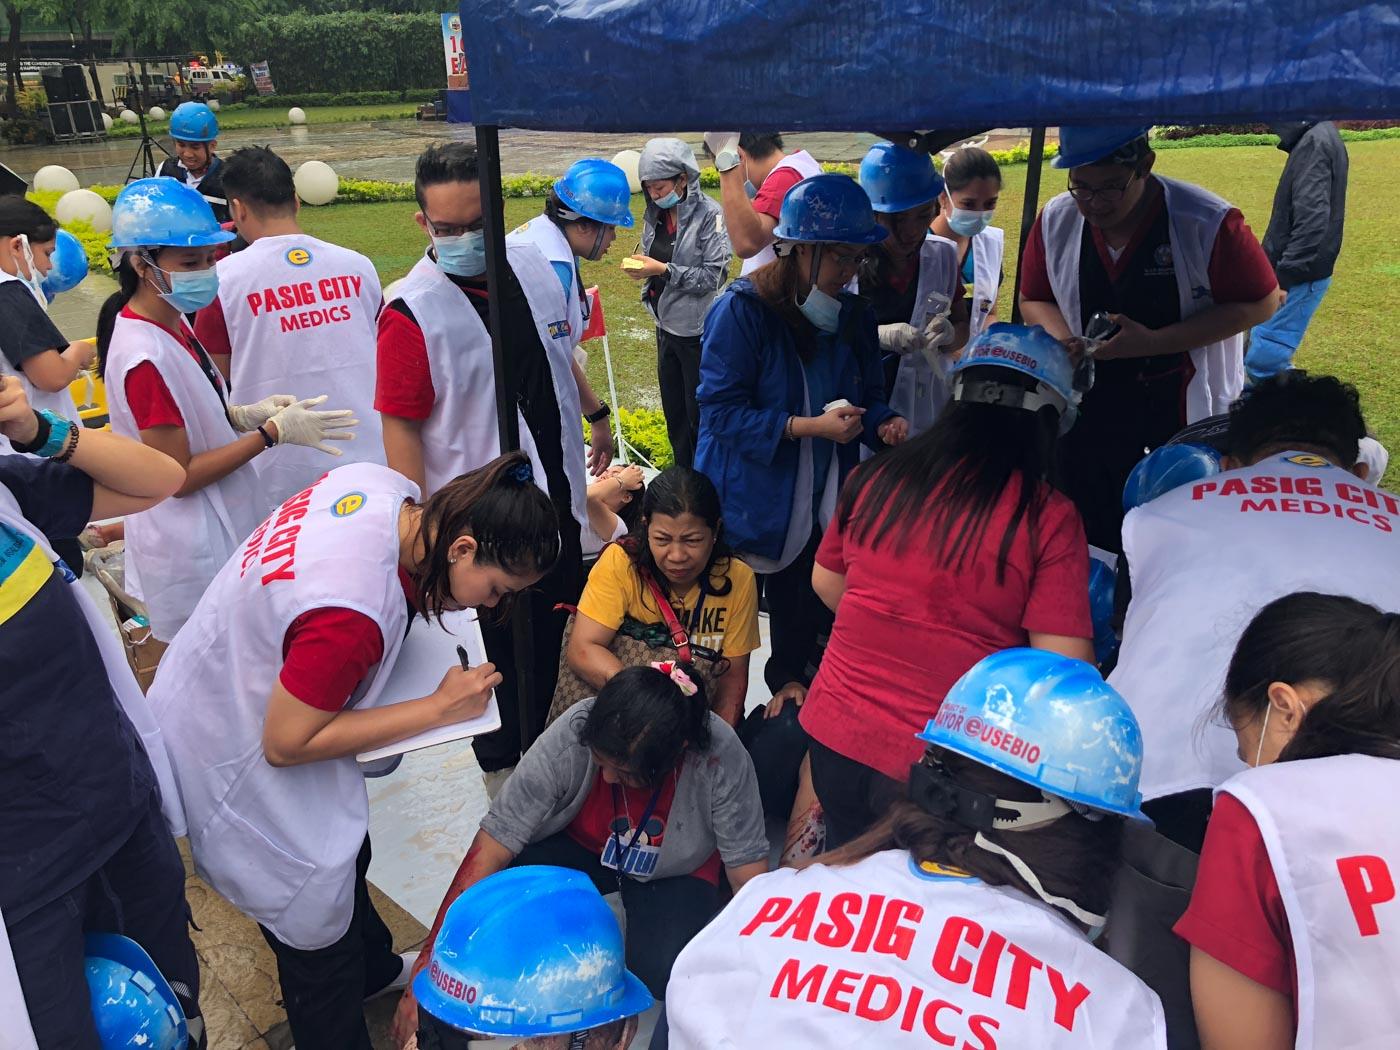 LIST. Pasig City medics take down names, ages and conditions to monitor injured civilians. Photo by Samantha Bagayas/Rappler